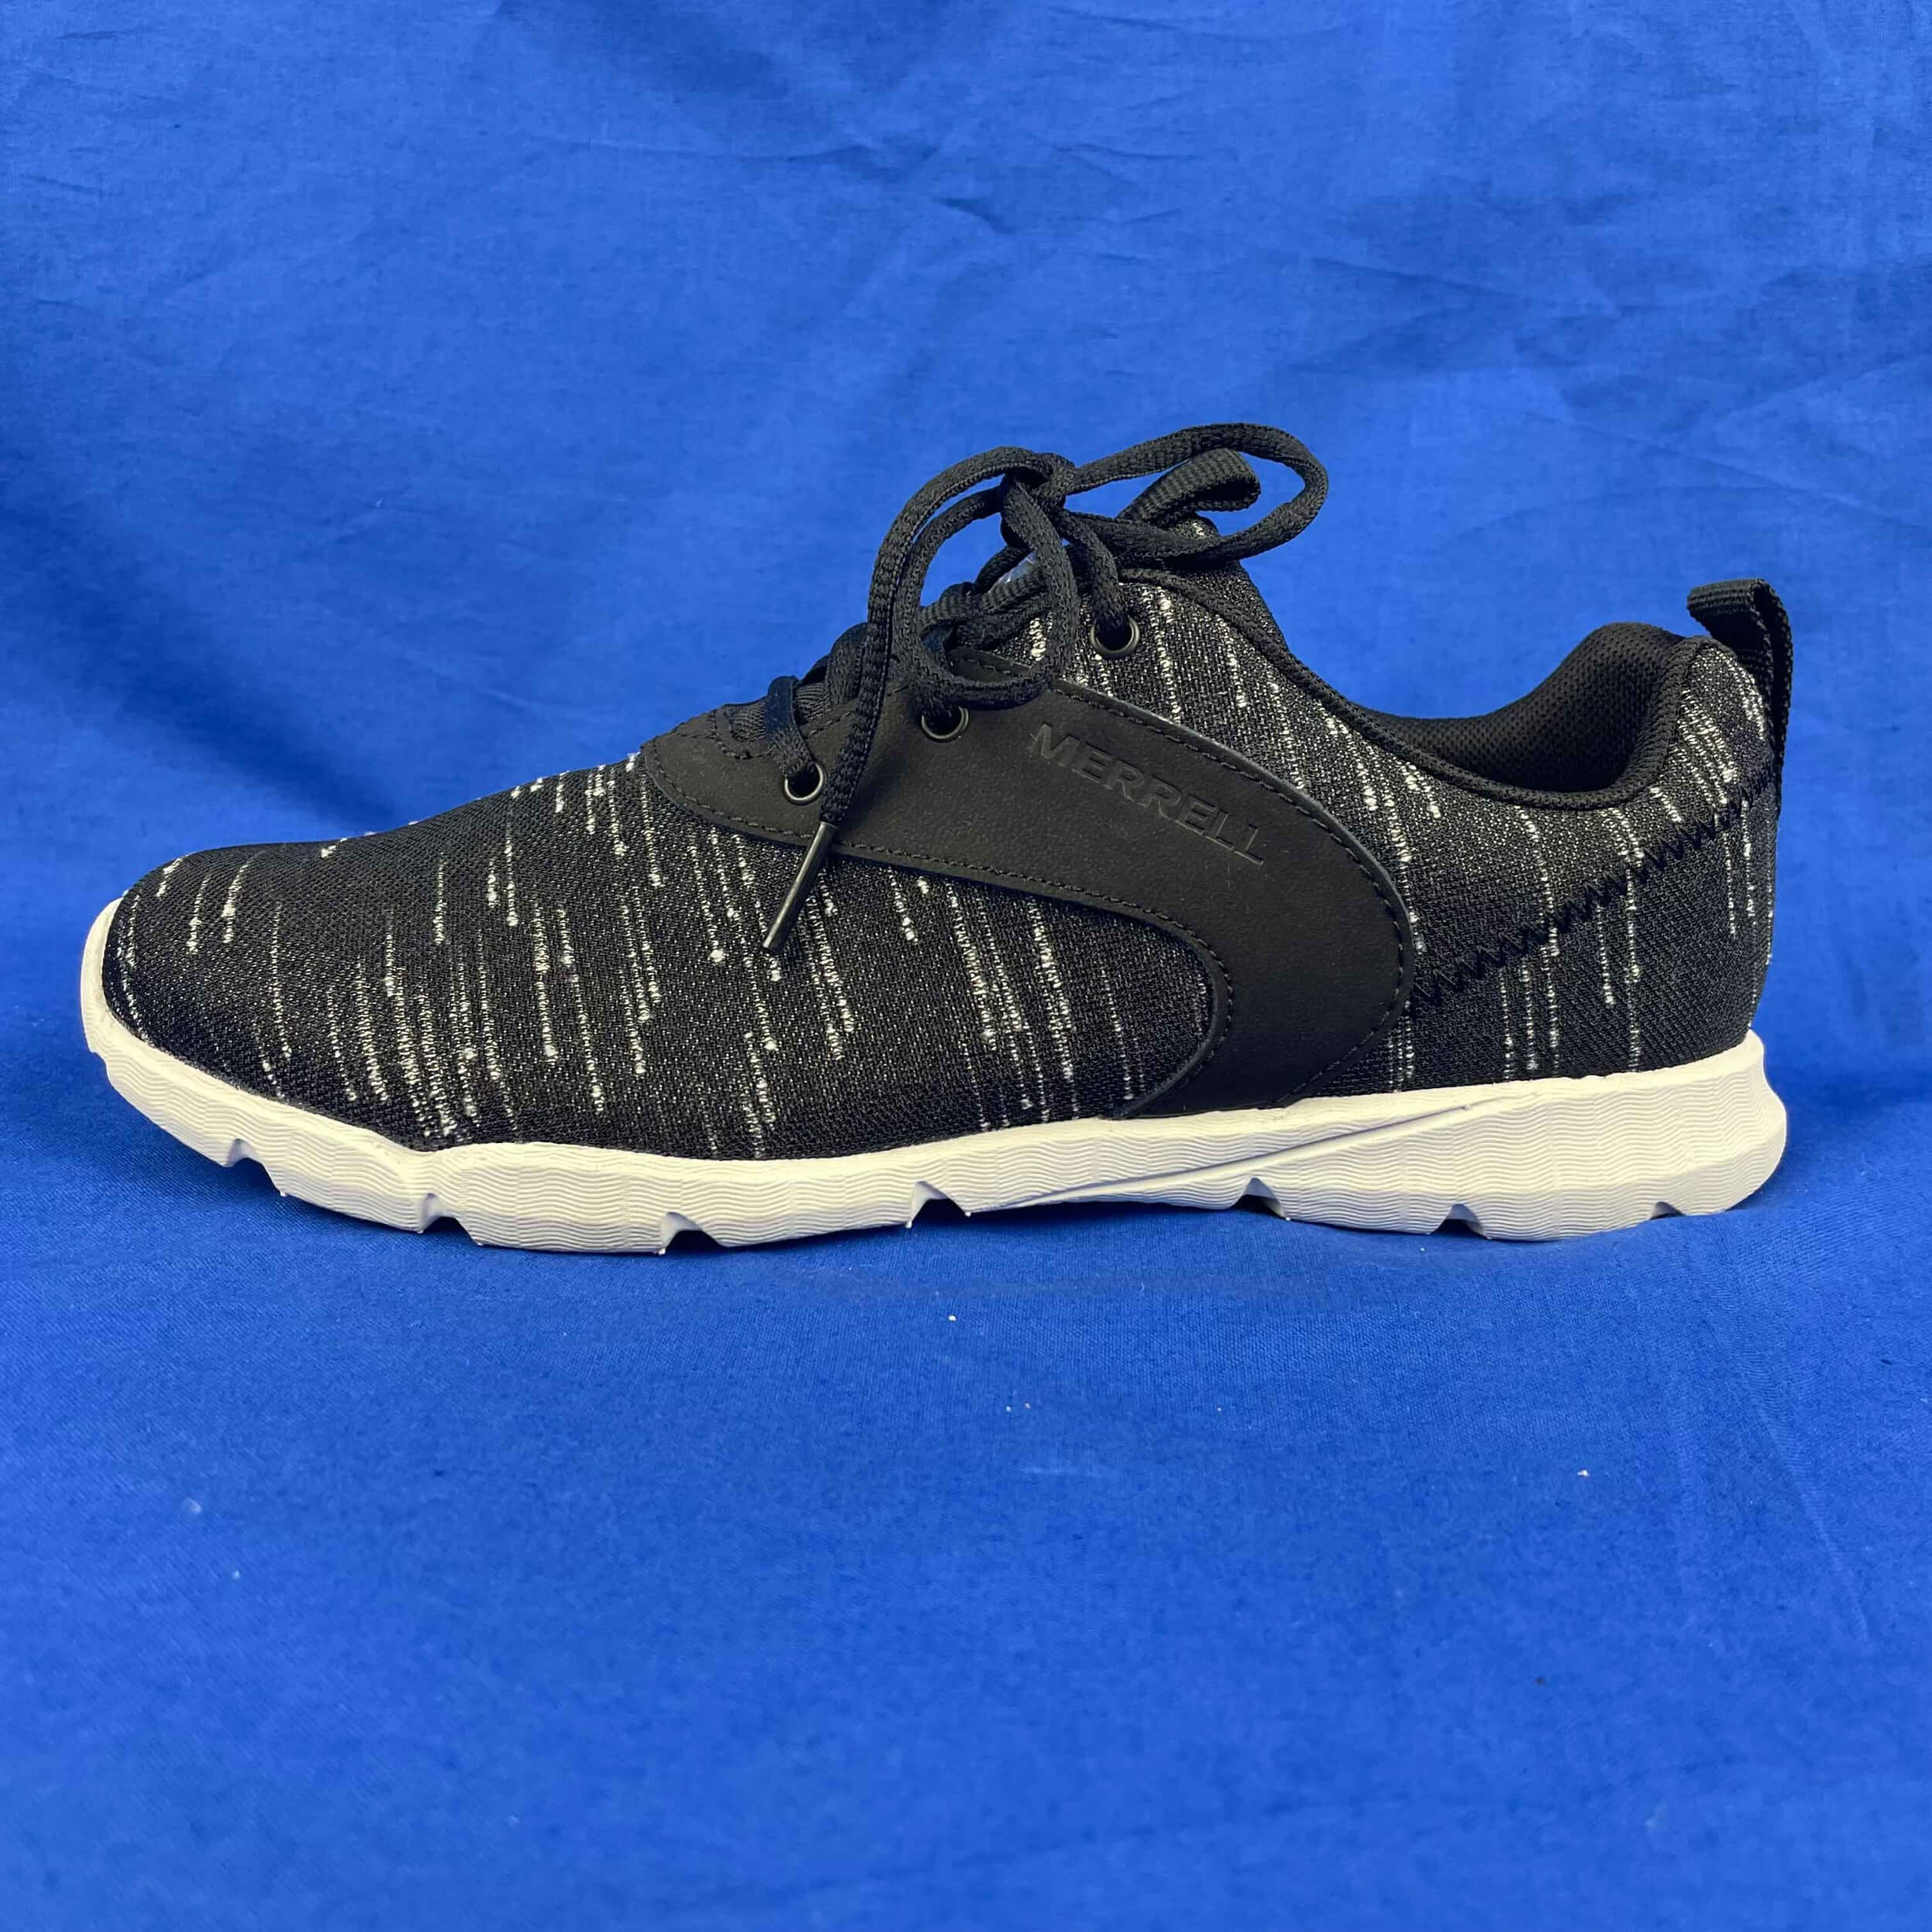 Merrell Damen Schuhe Flora Day Lace J97728 schwarz